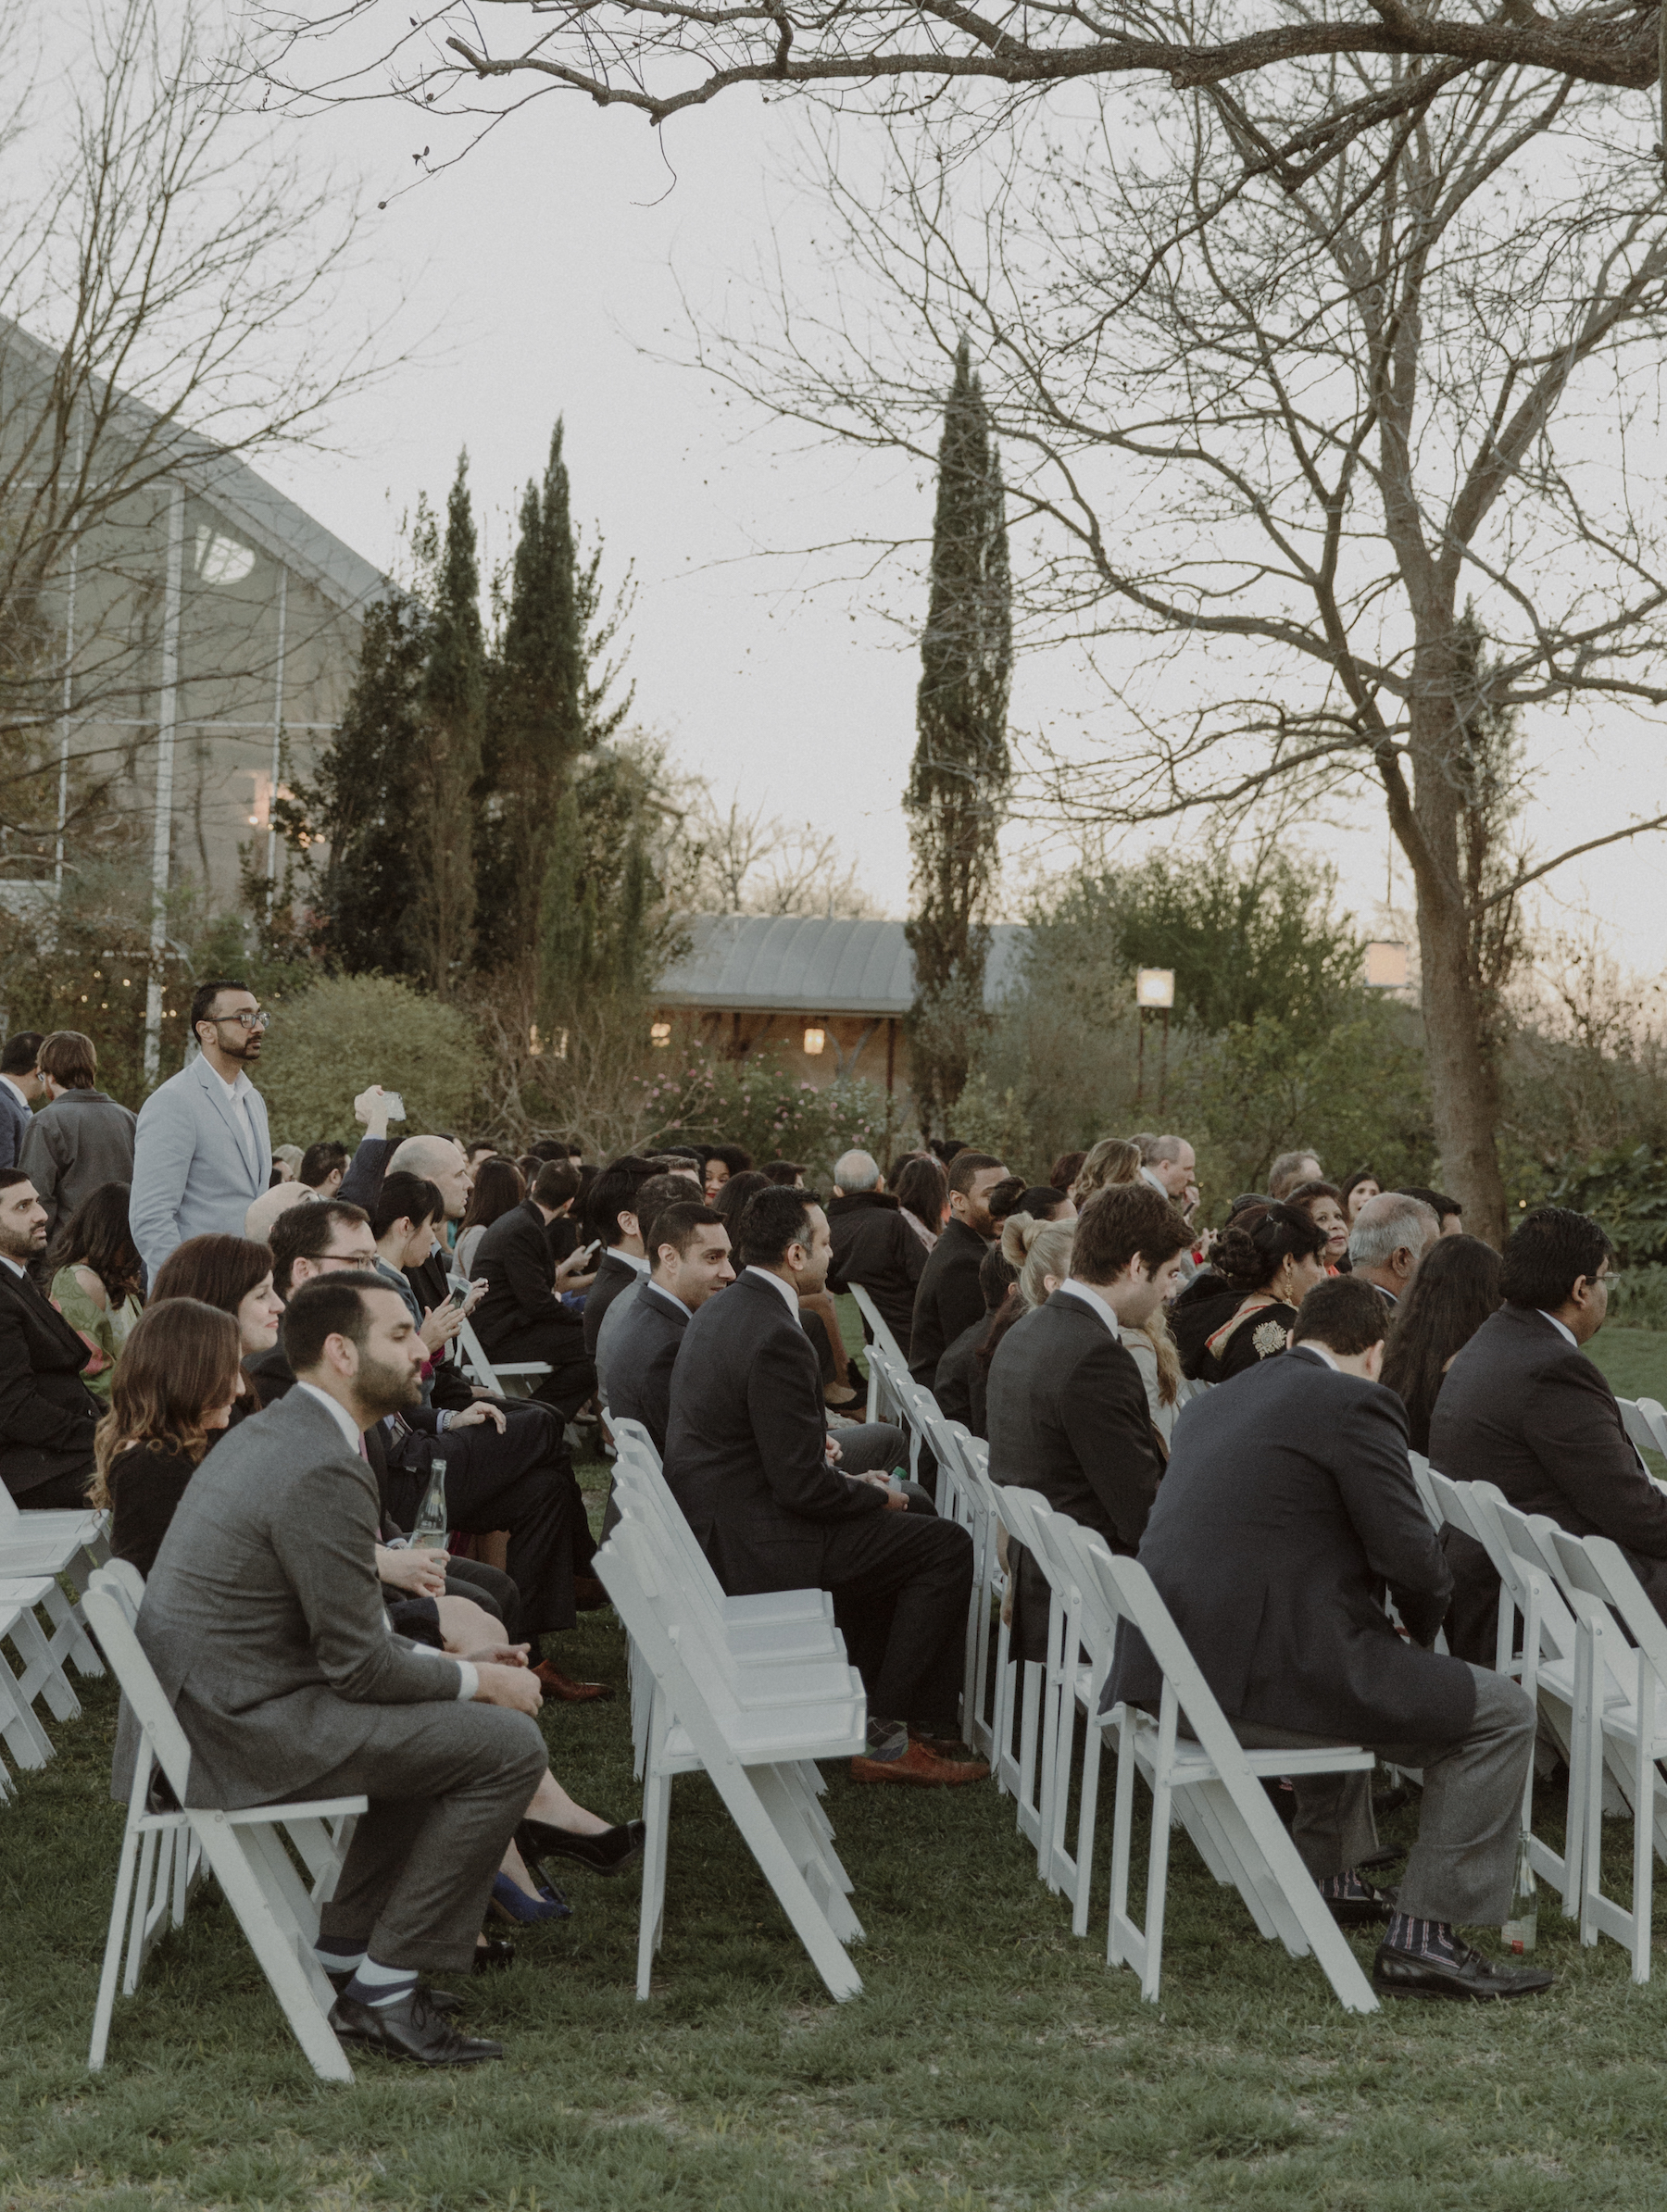 barr-mansion-wedding-austin-texas8885.JPG